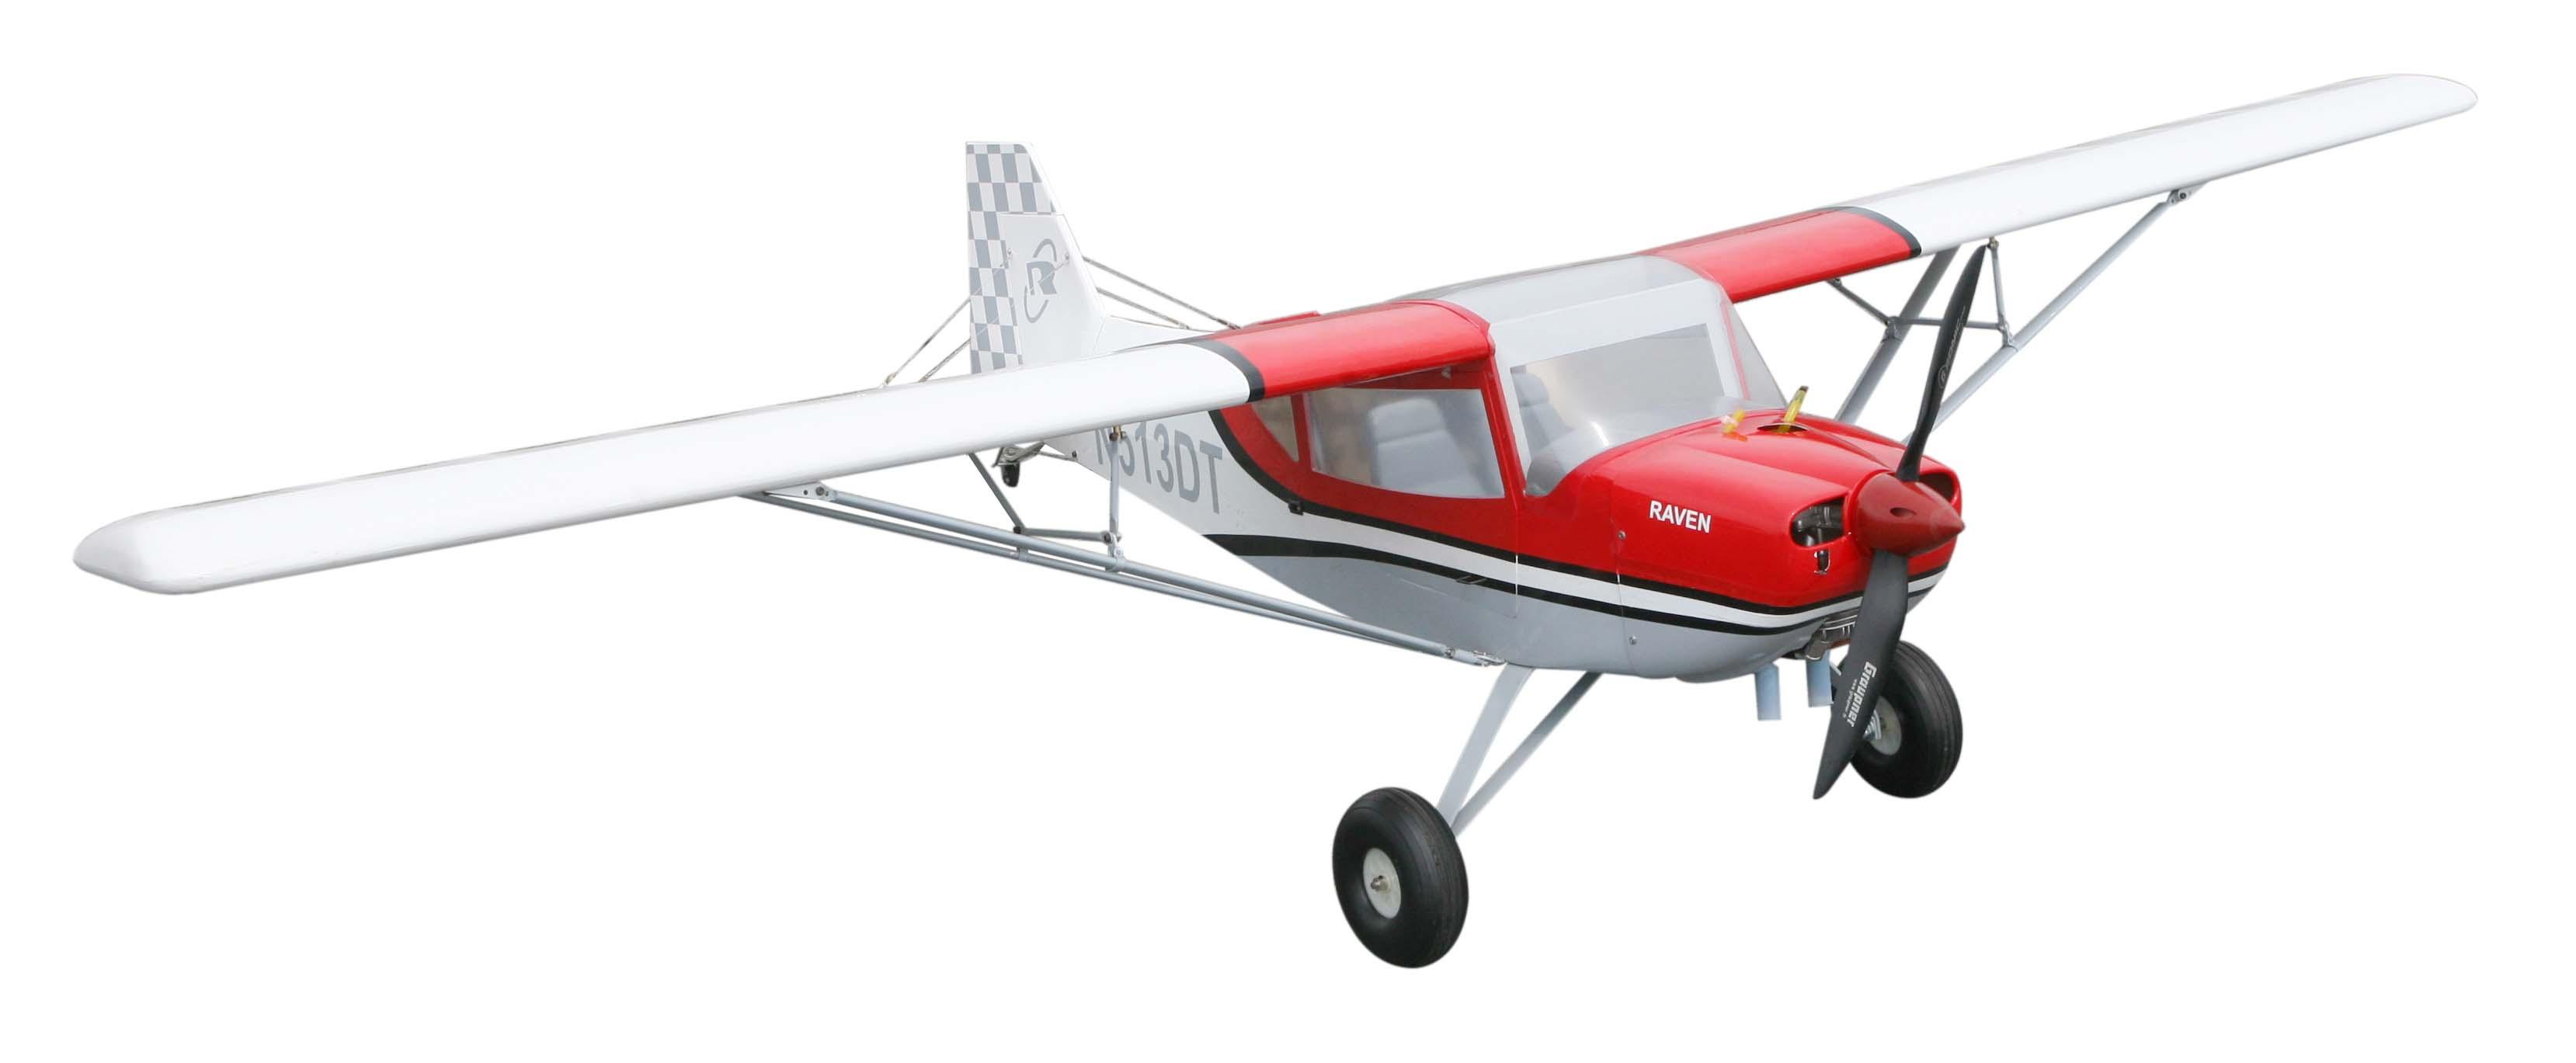 Rans S-20 Raven 20cc Seagull Models